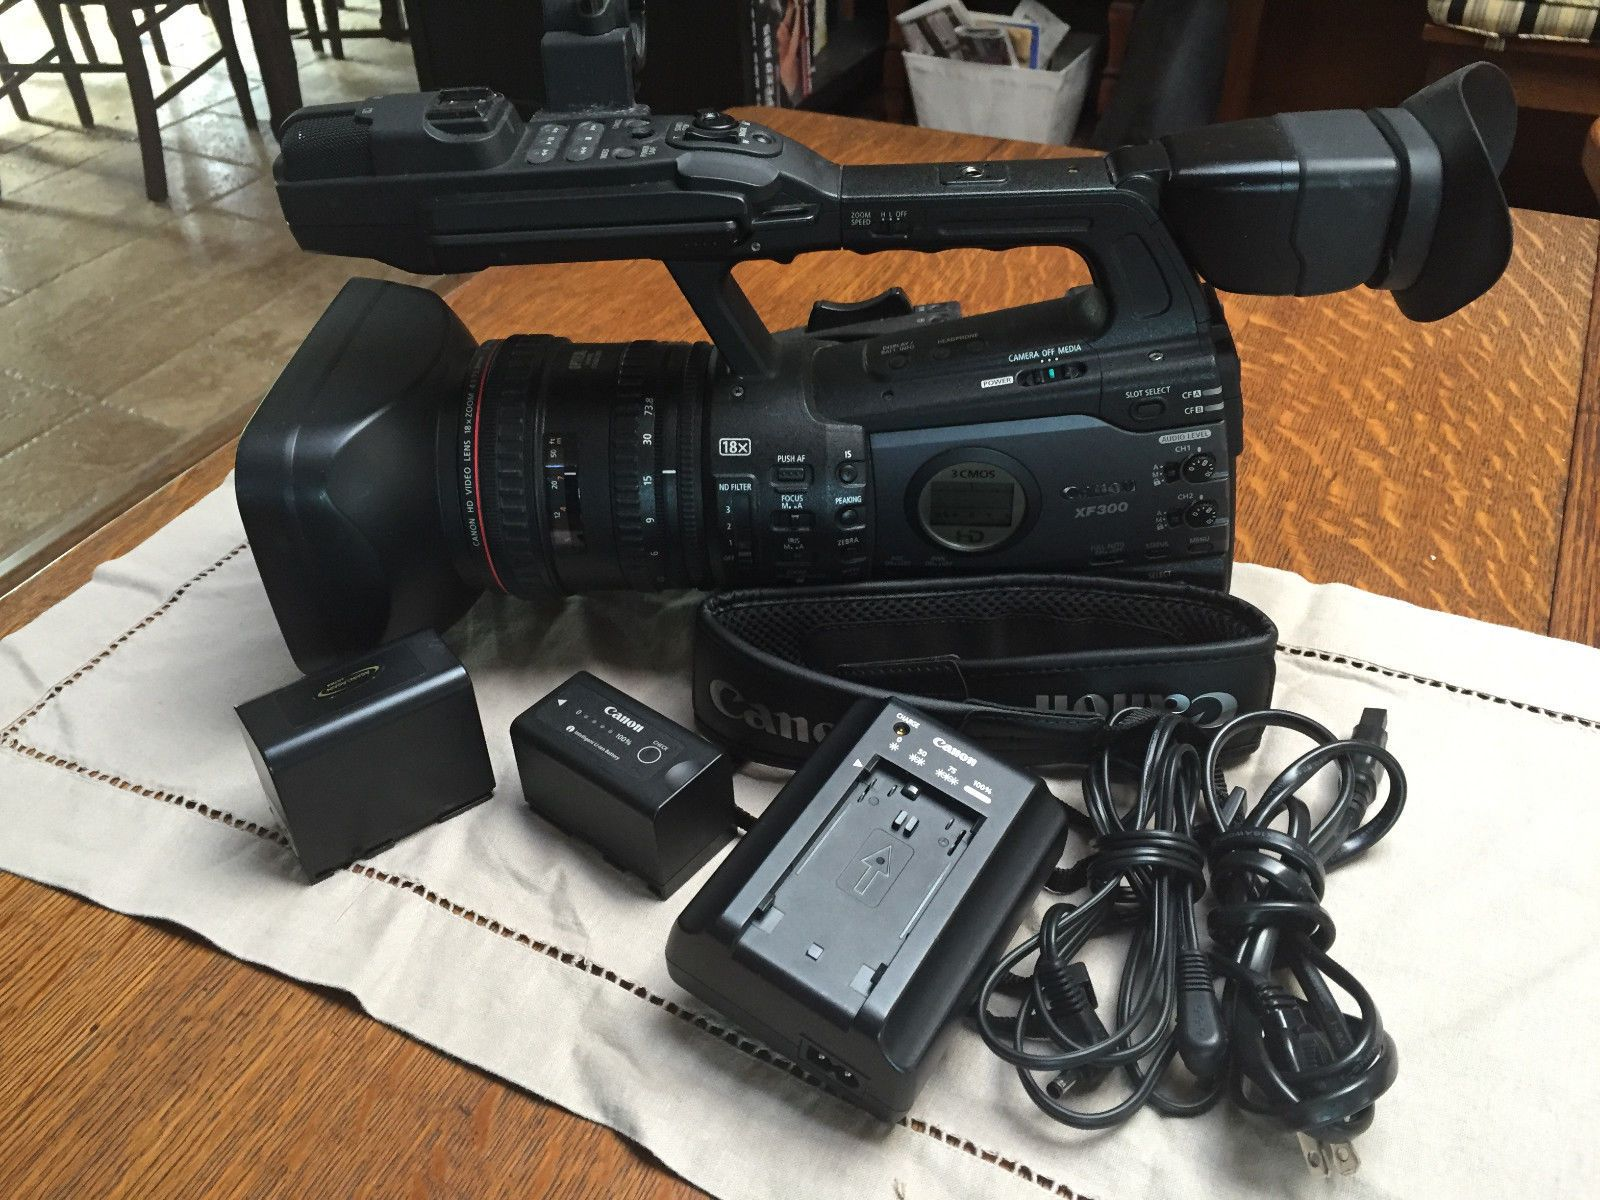 Canon XF300 Camcorder Home appliances, Vacuums, Camcorder